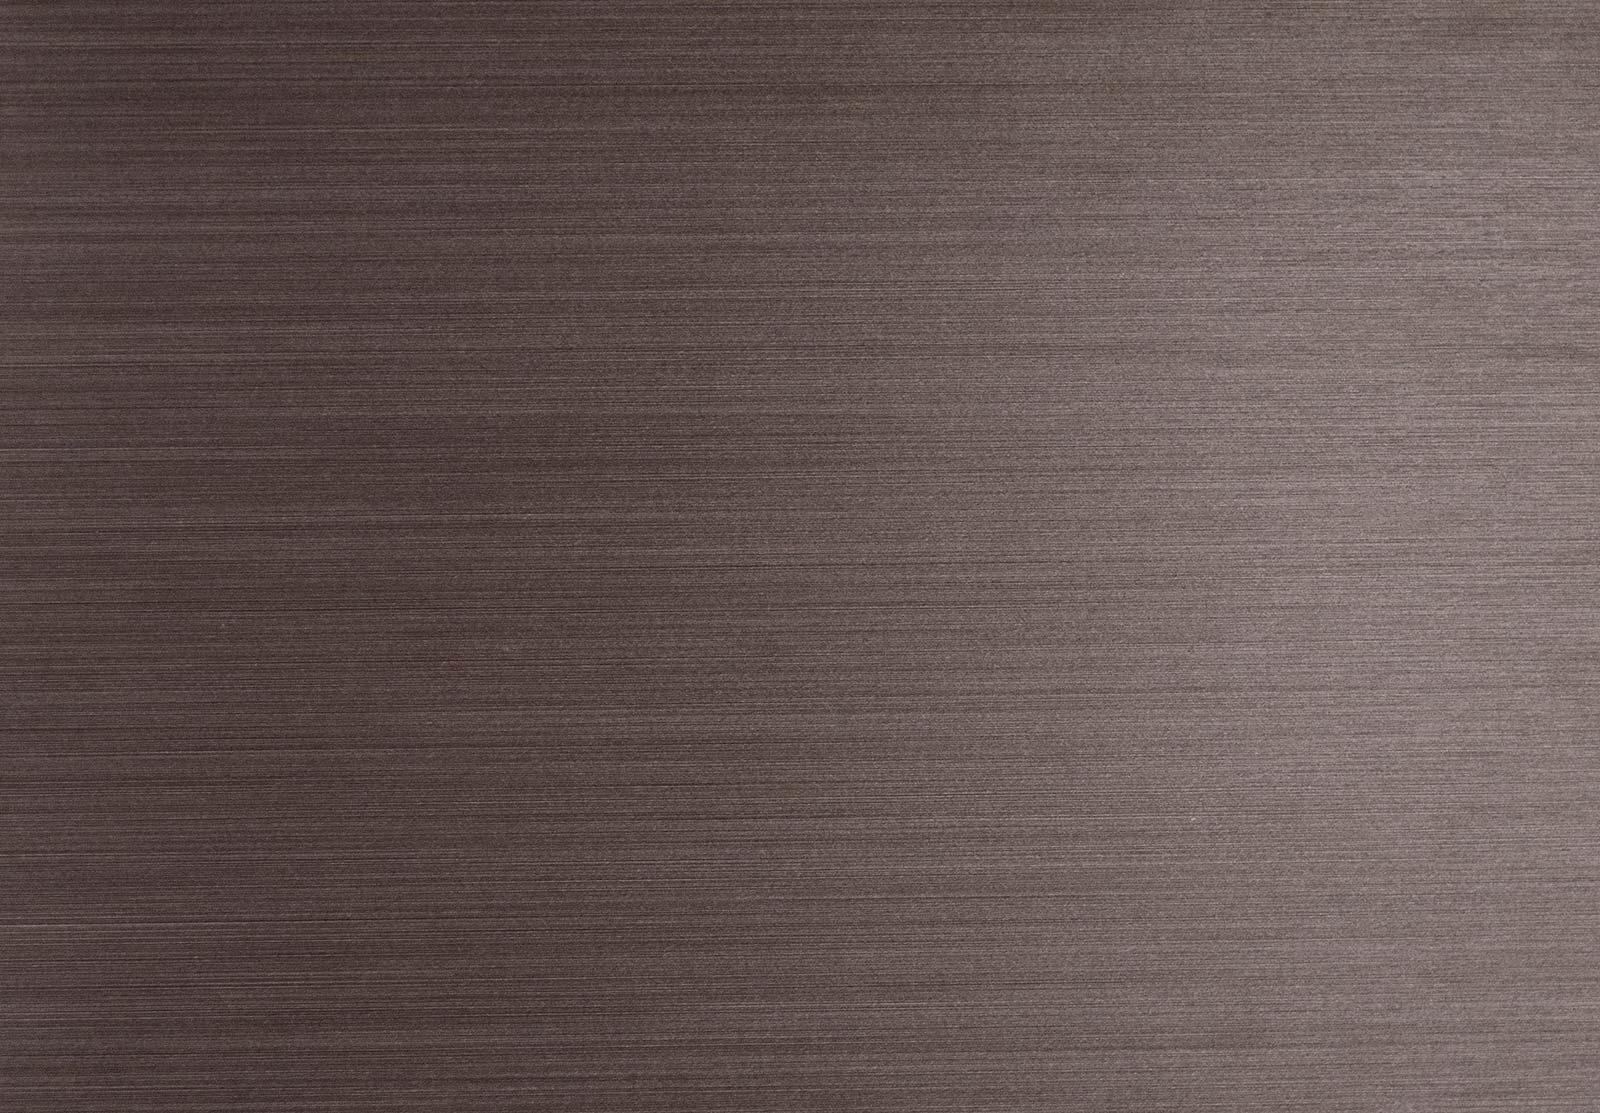 Pannelli alfawood - Shiny Grey 3015